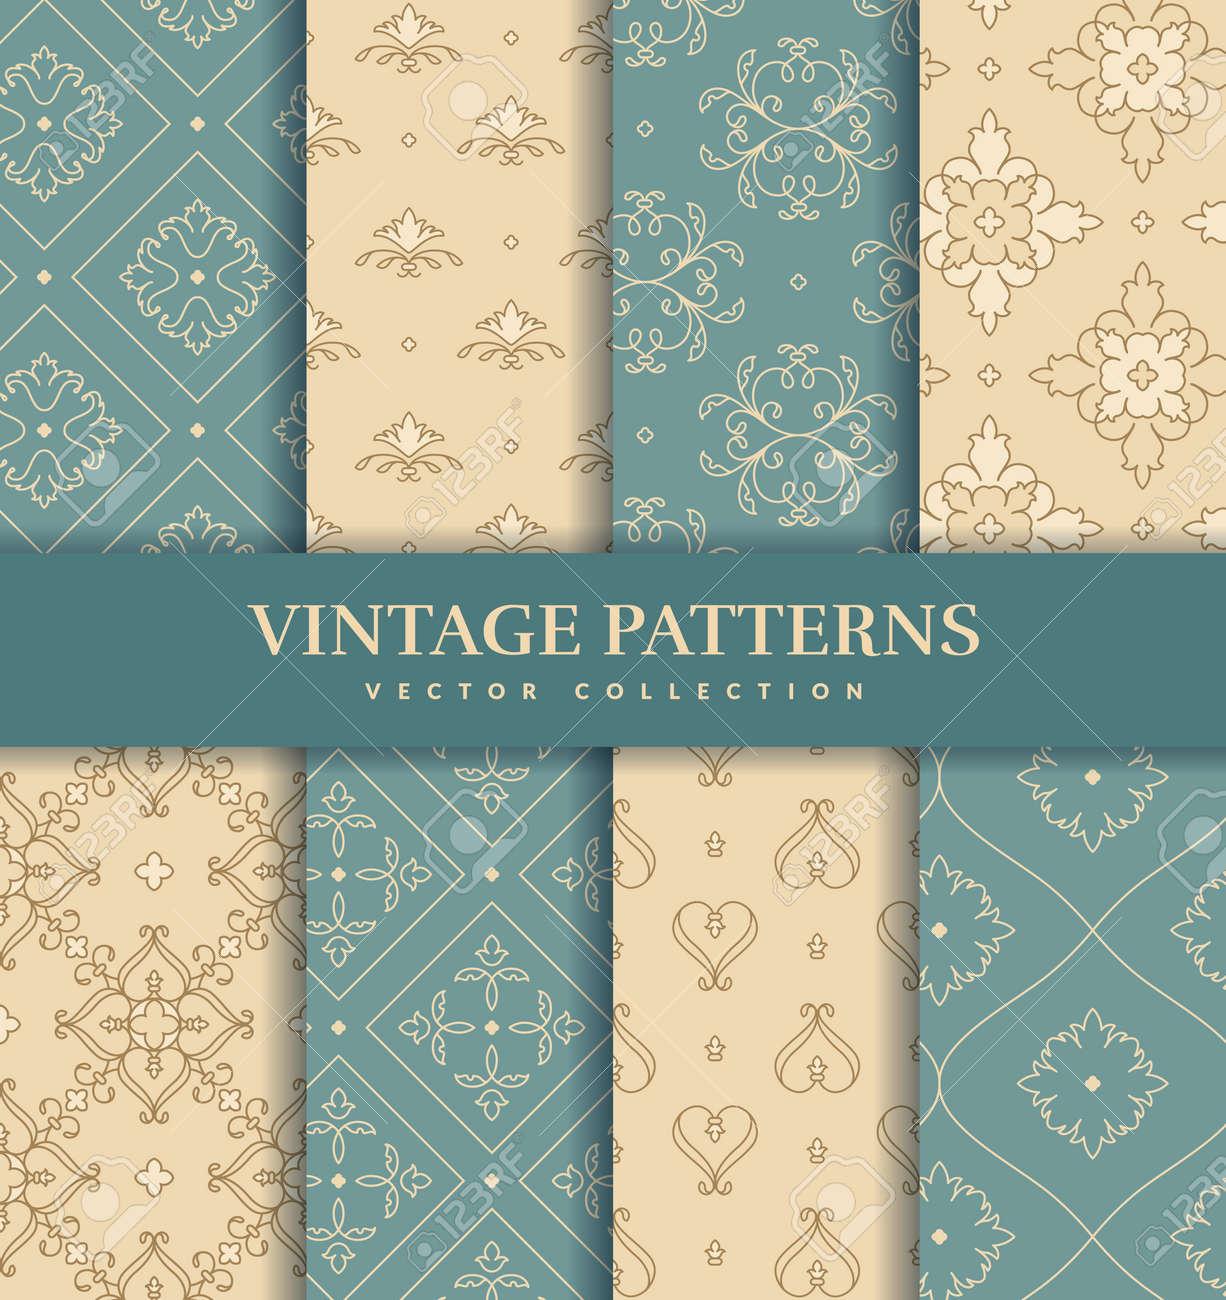 Vintage seamless patterns. Elegant abstract ornaments. Vector set. - 169243861